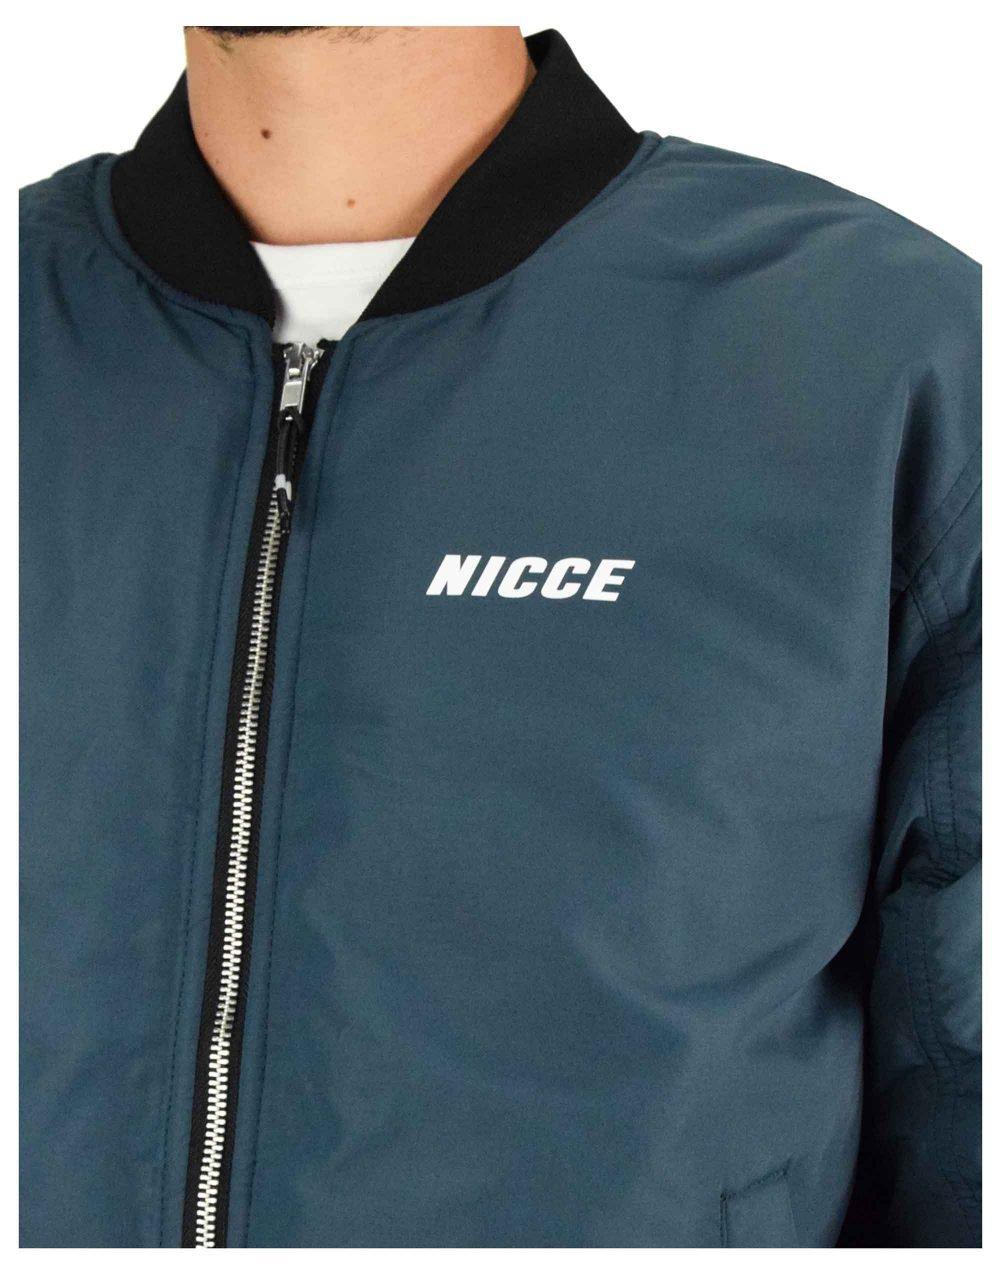 Nicce Fleet Bomber Jacket (203-1-01-08-0255) Airforce Blue